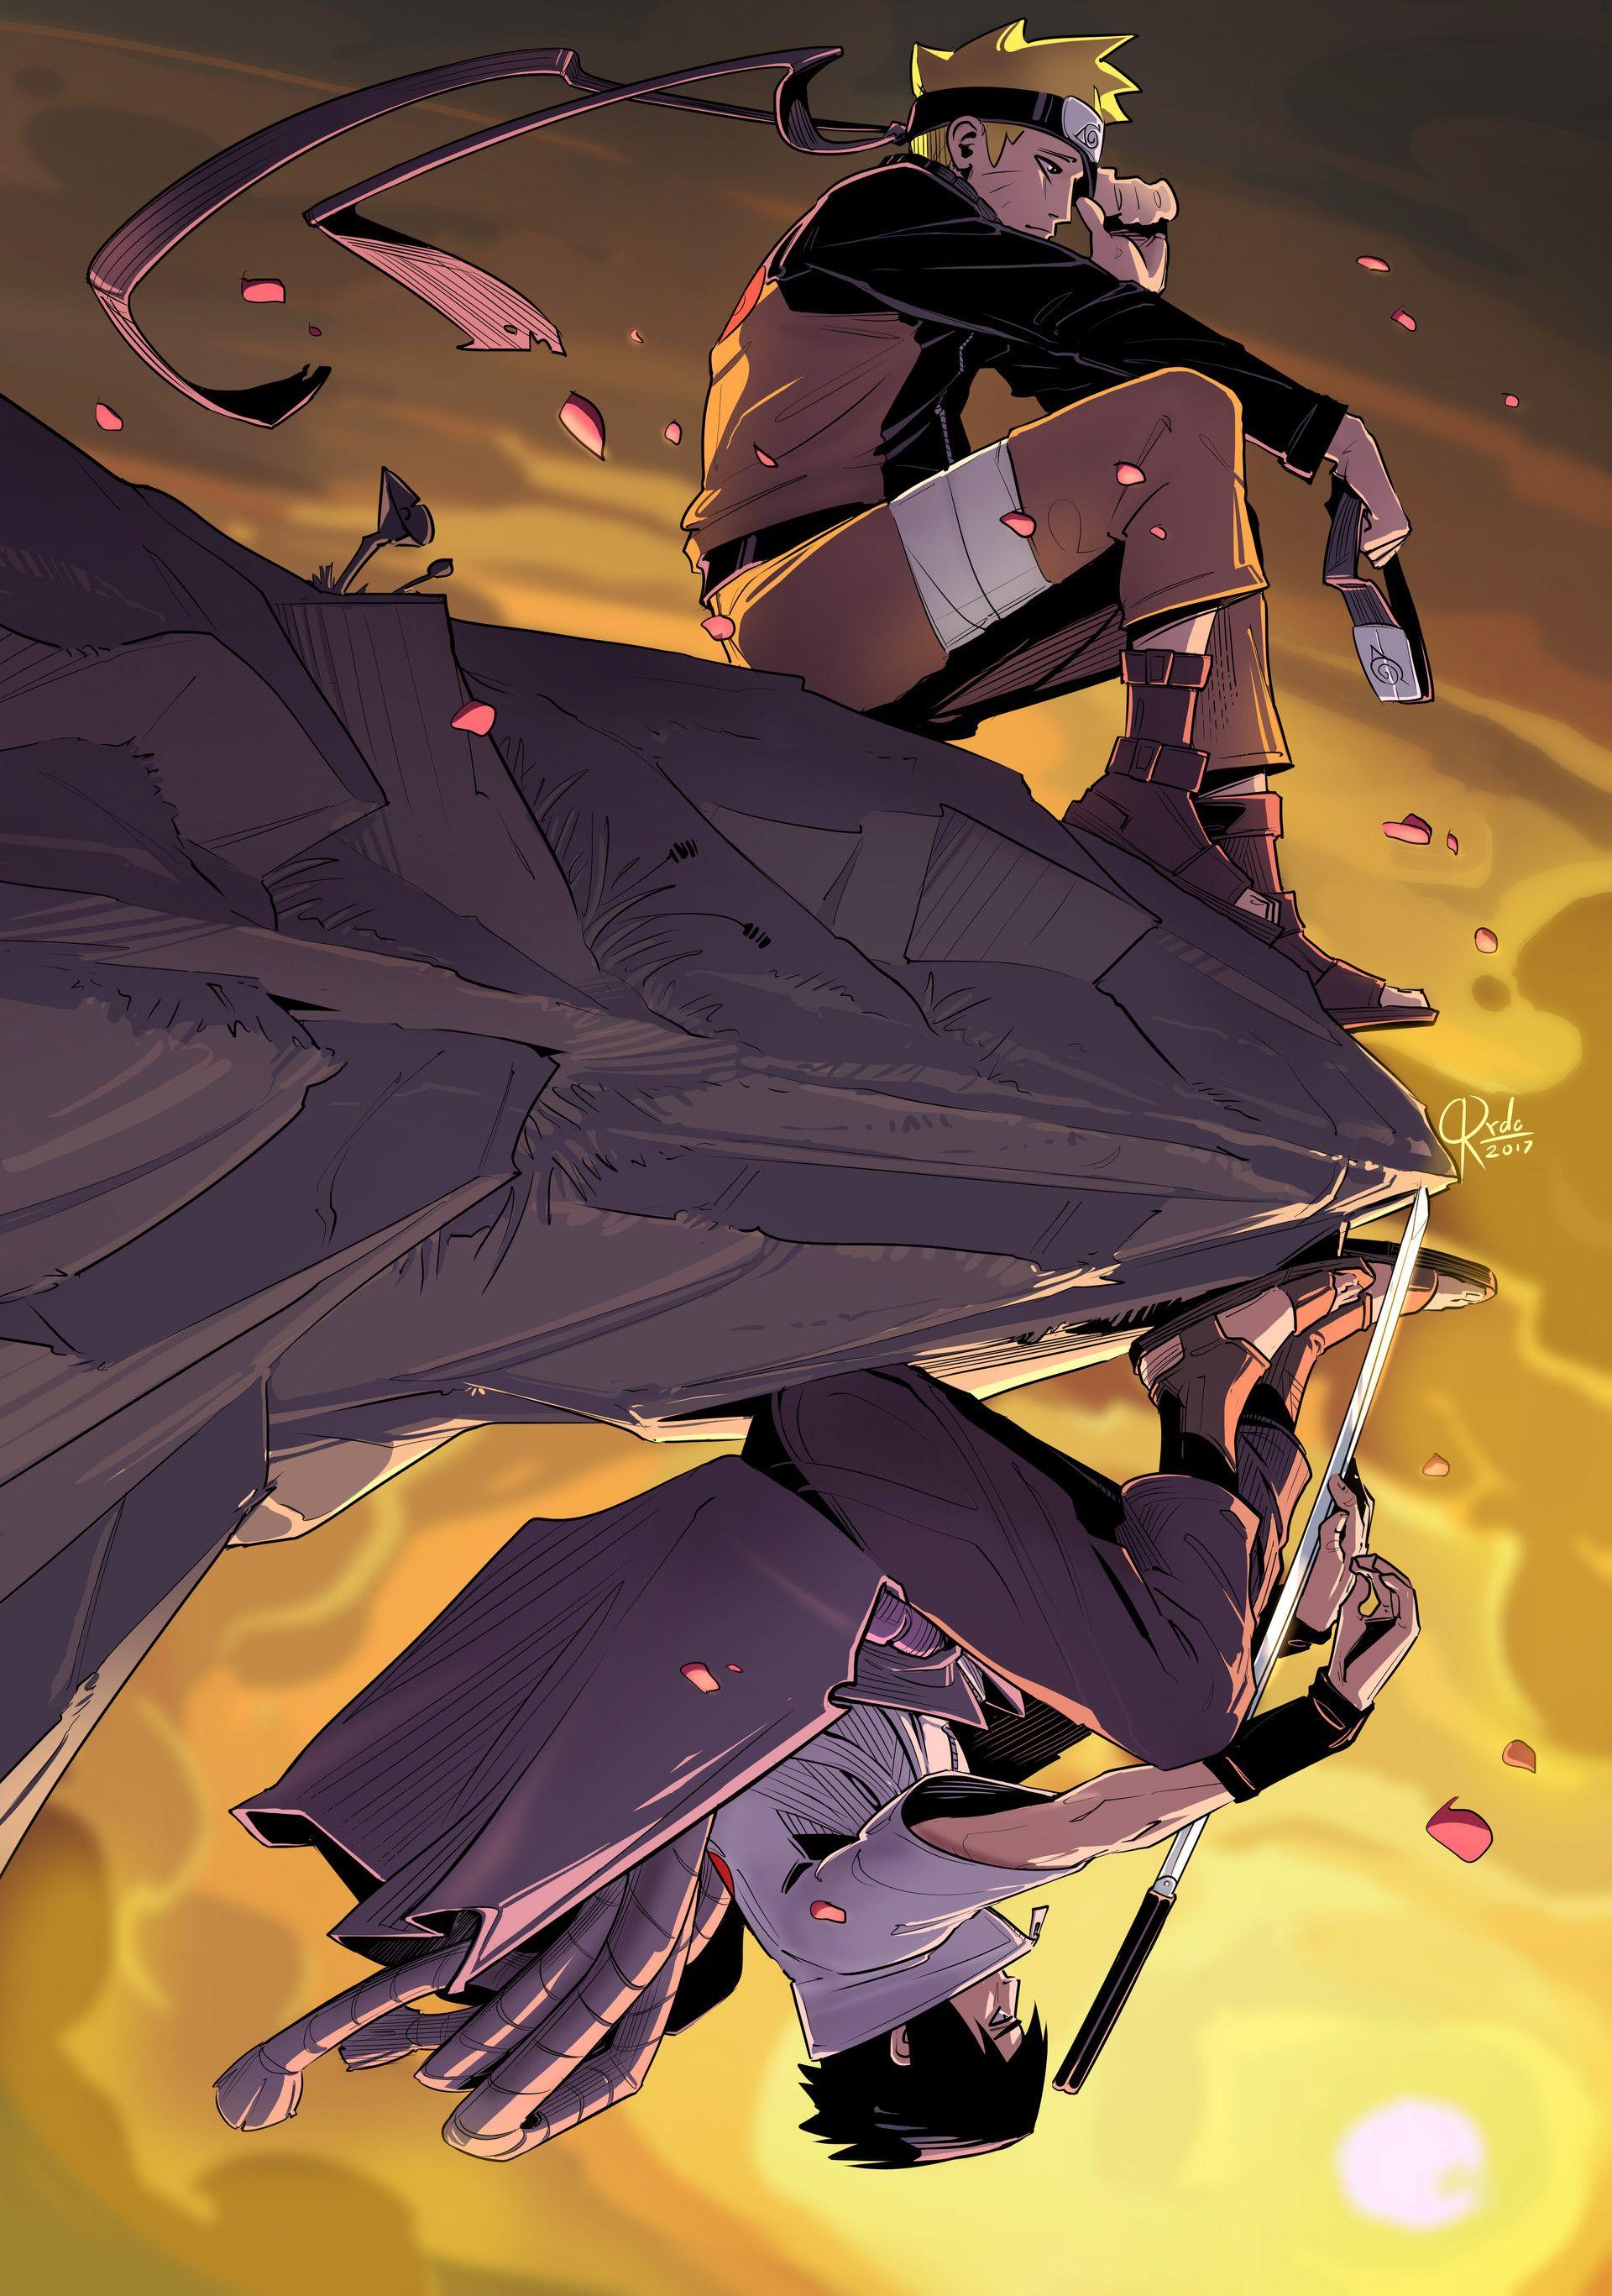 Naruto And Sasuke Naruto Pinterest Naruto Sasuke And Anime